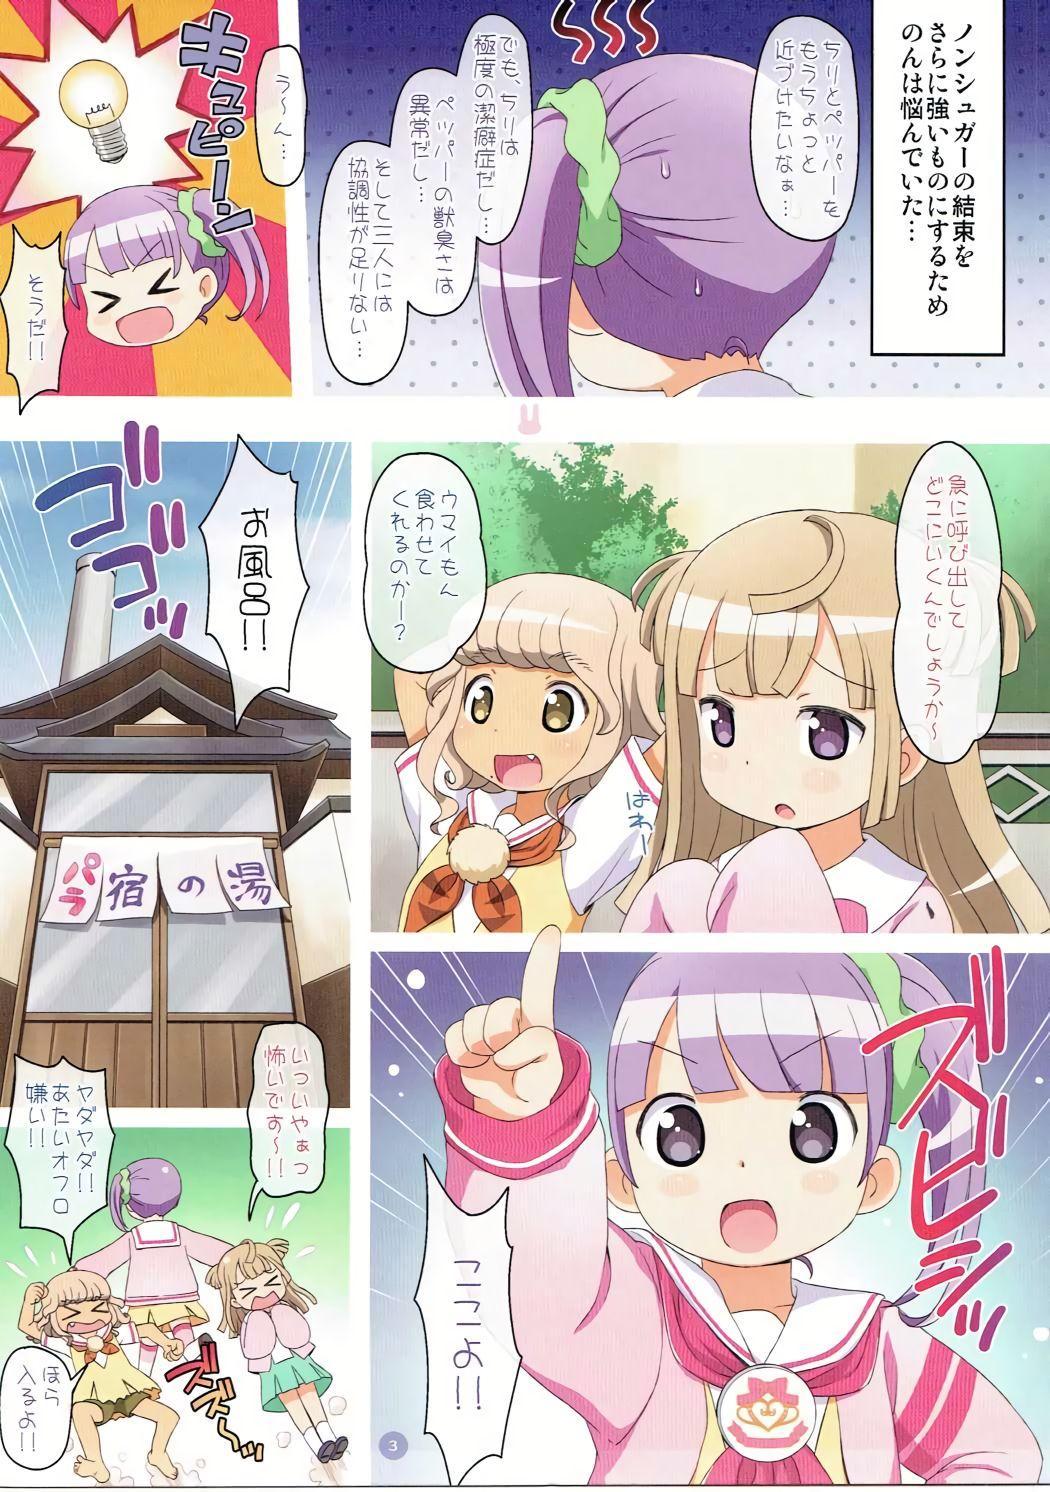 Amasou de Amakunai Chotto Amai Nonsugar 2